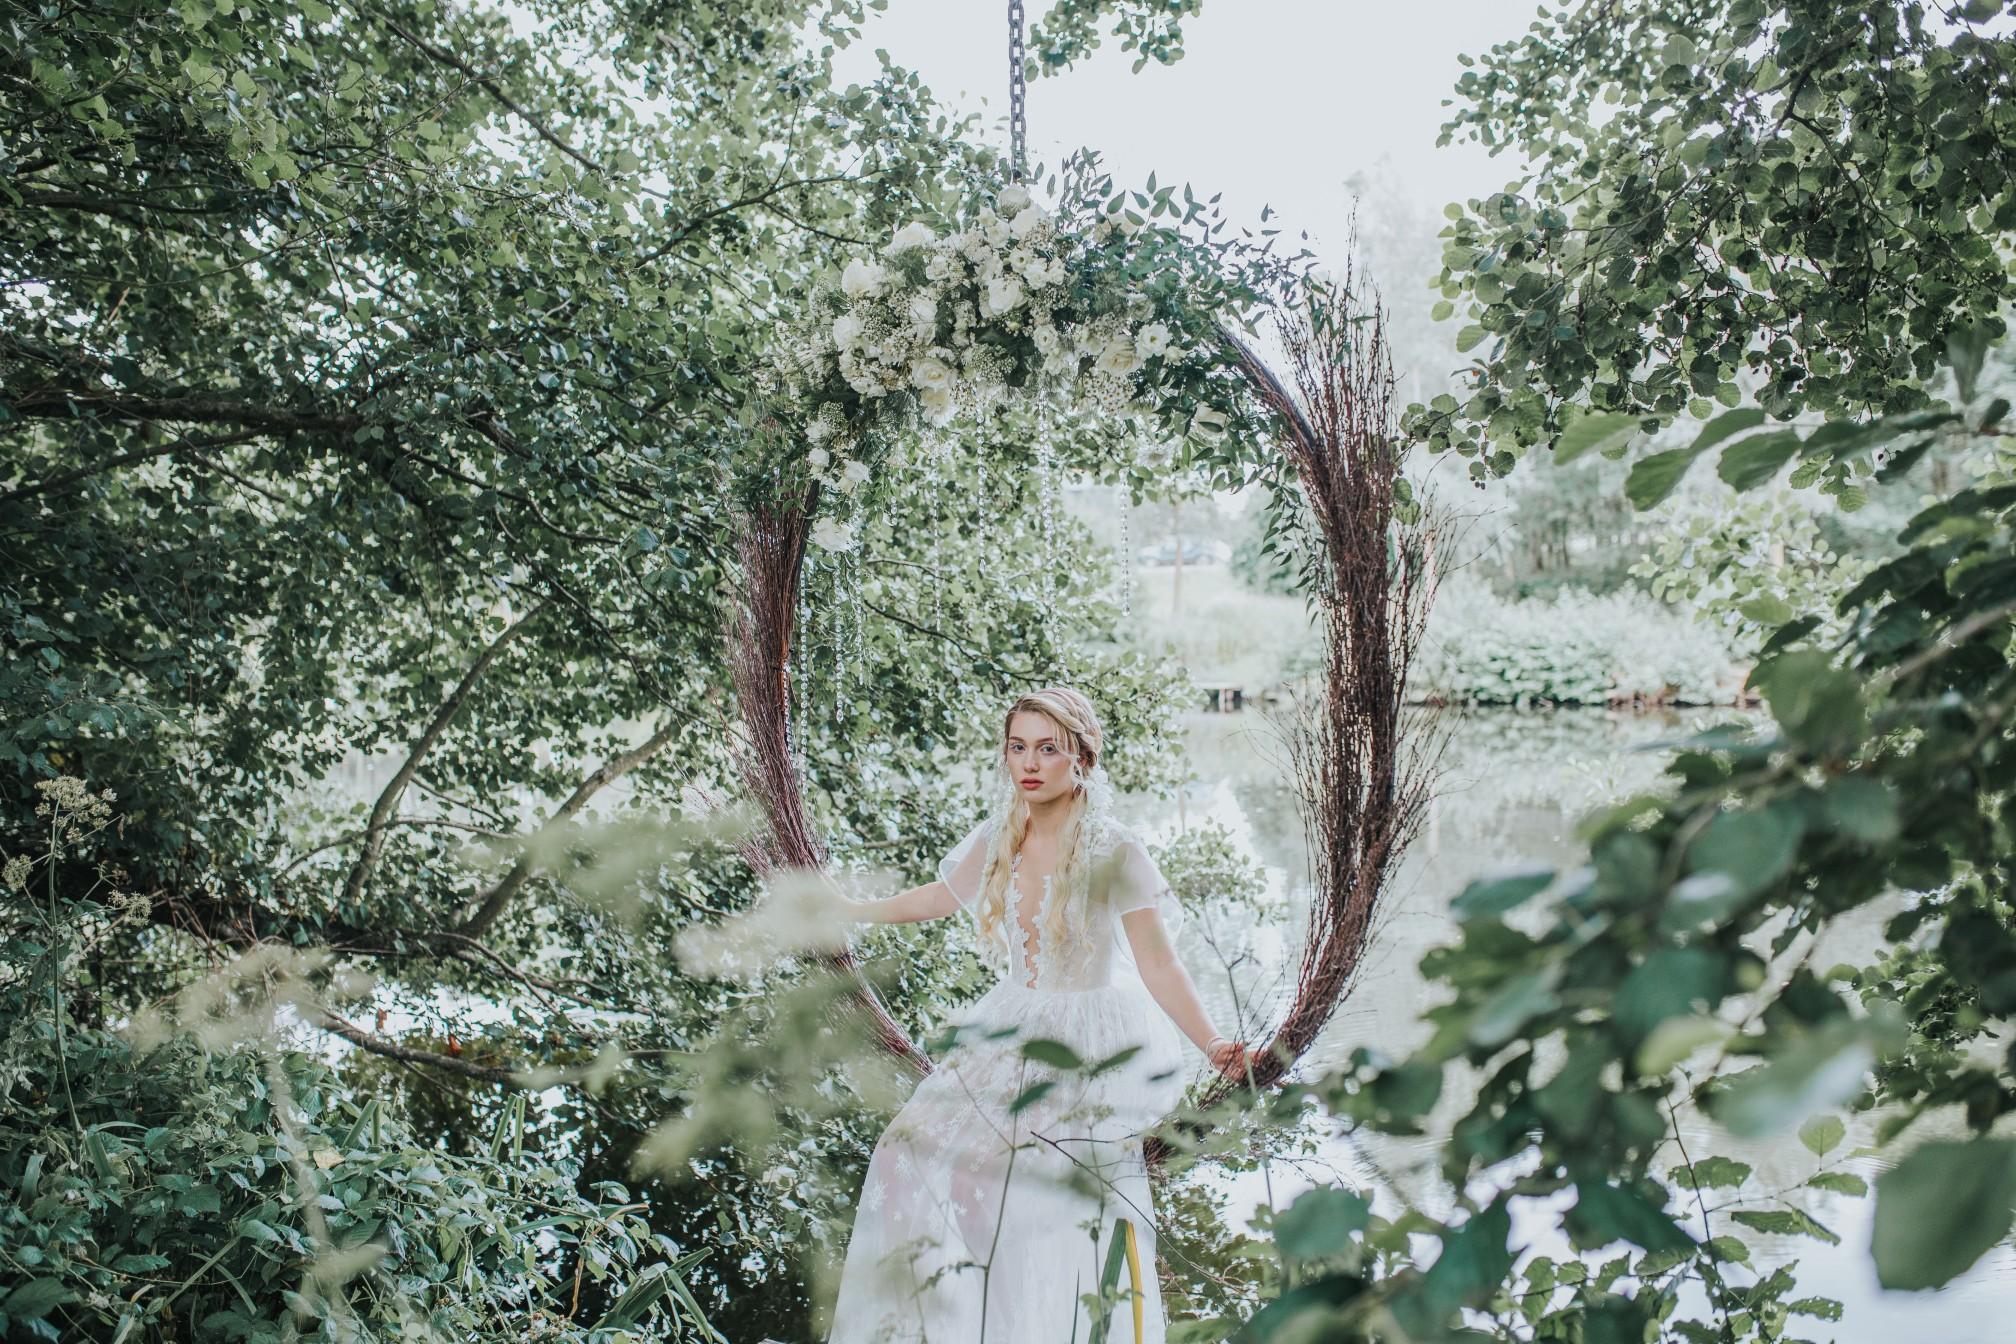 fairy wedding - whimsical wedding - magical wedding - elegant wedding dress - outdoor suspended hoop - wedding hoop